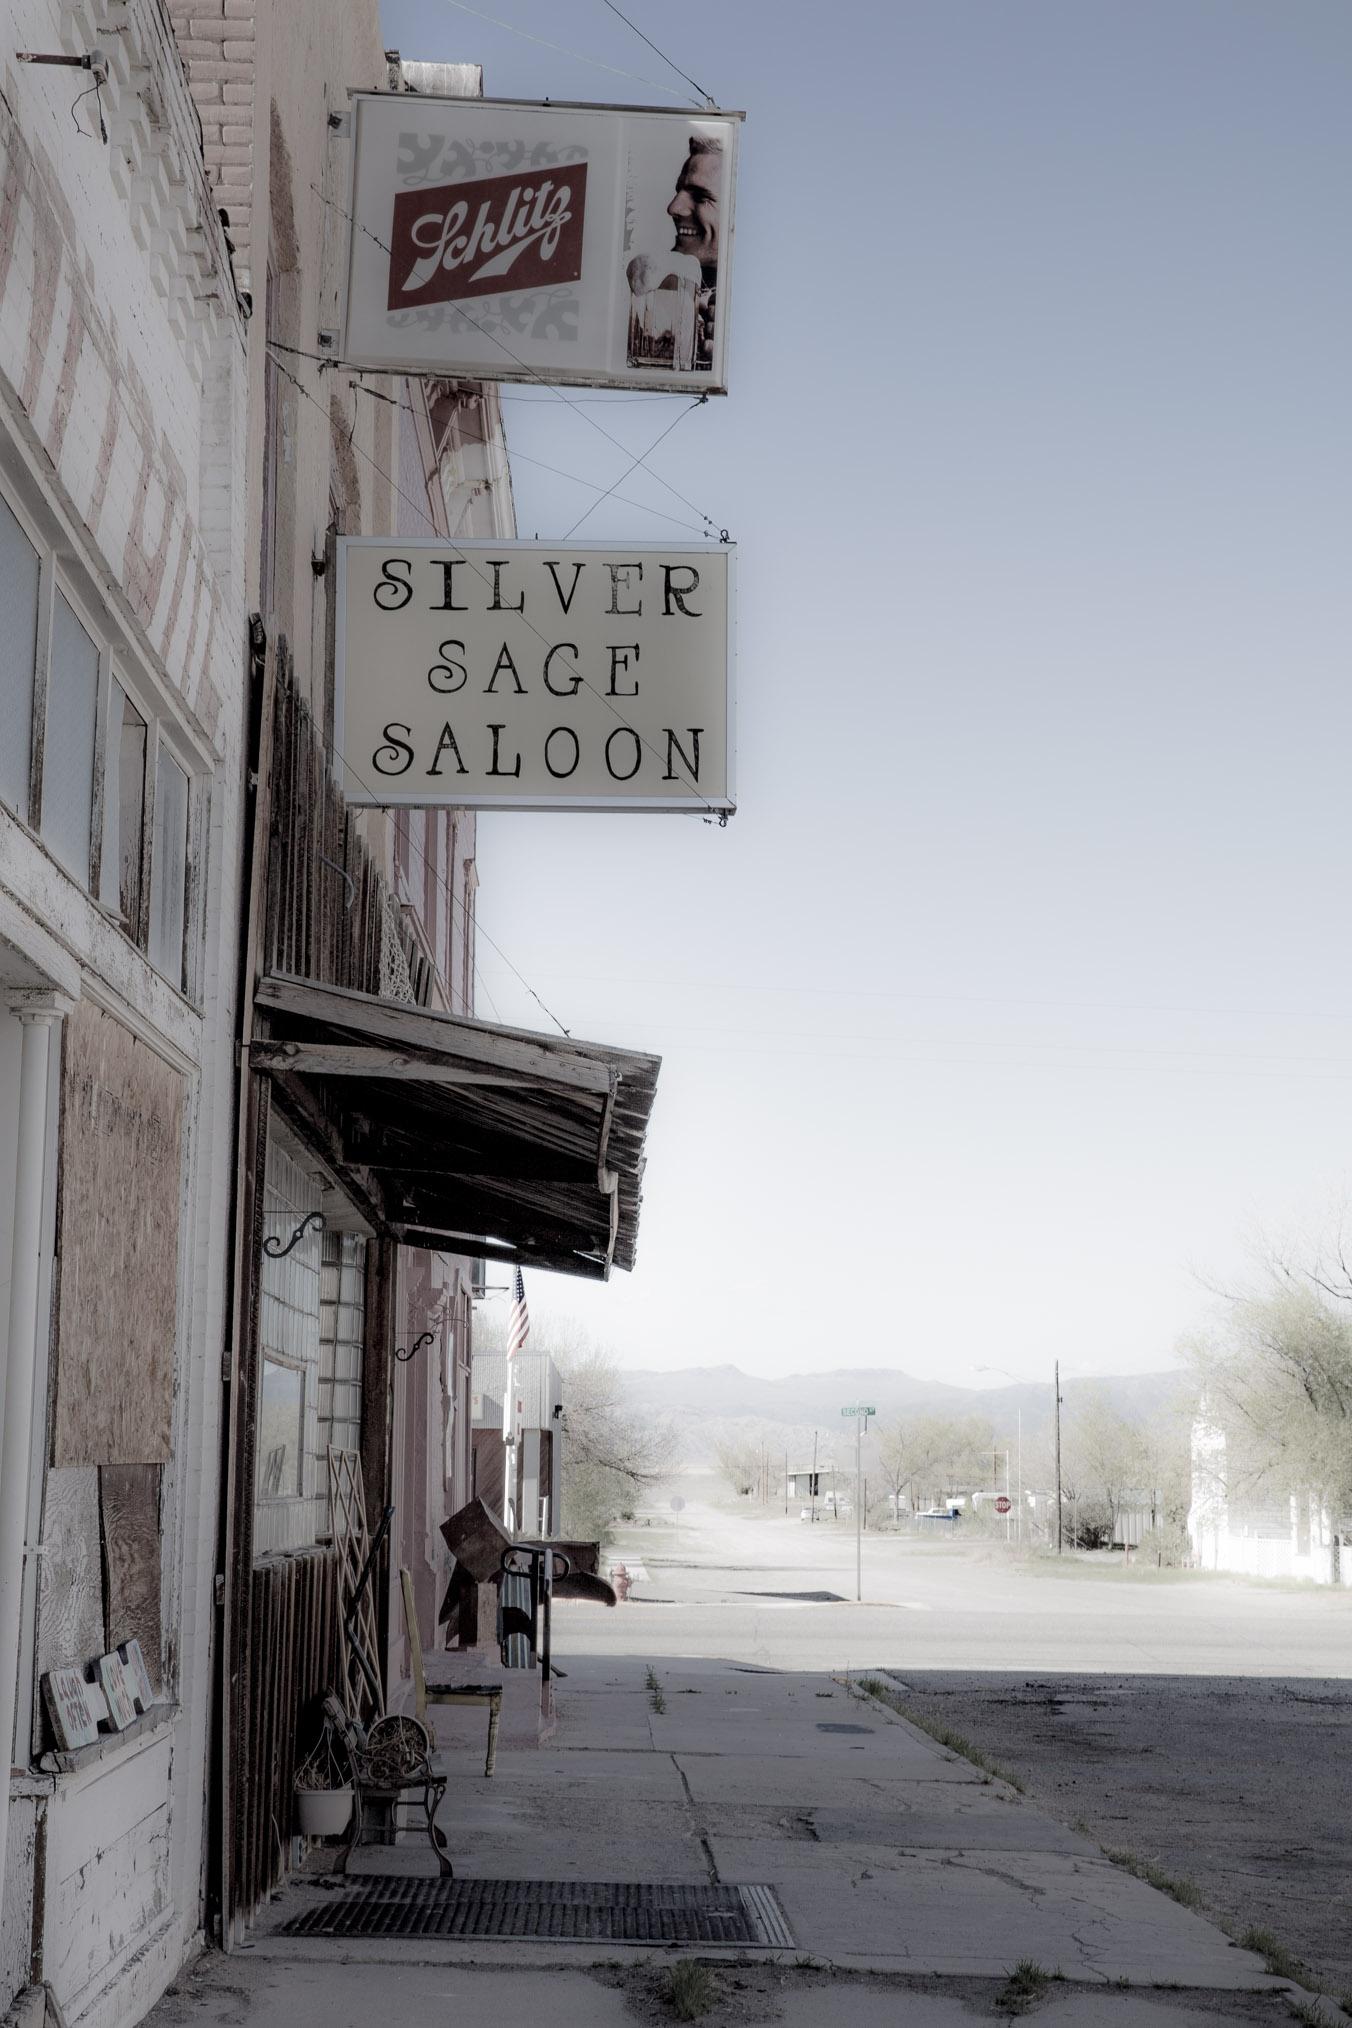 silver sage saloon.jpg